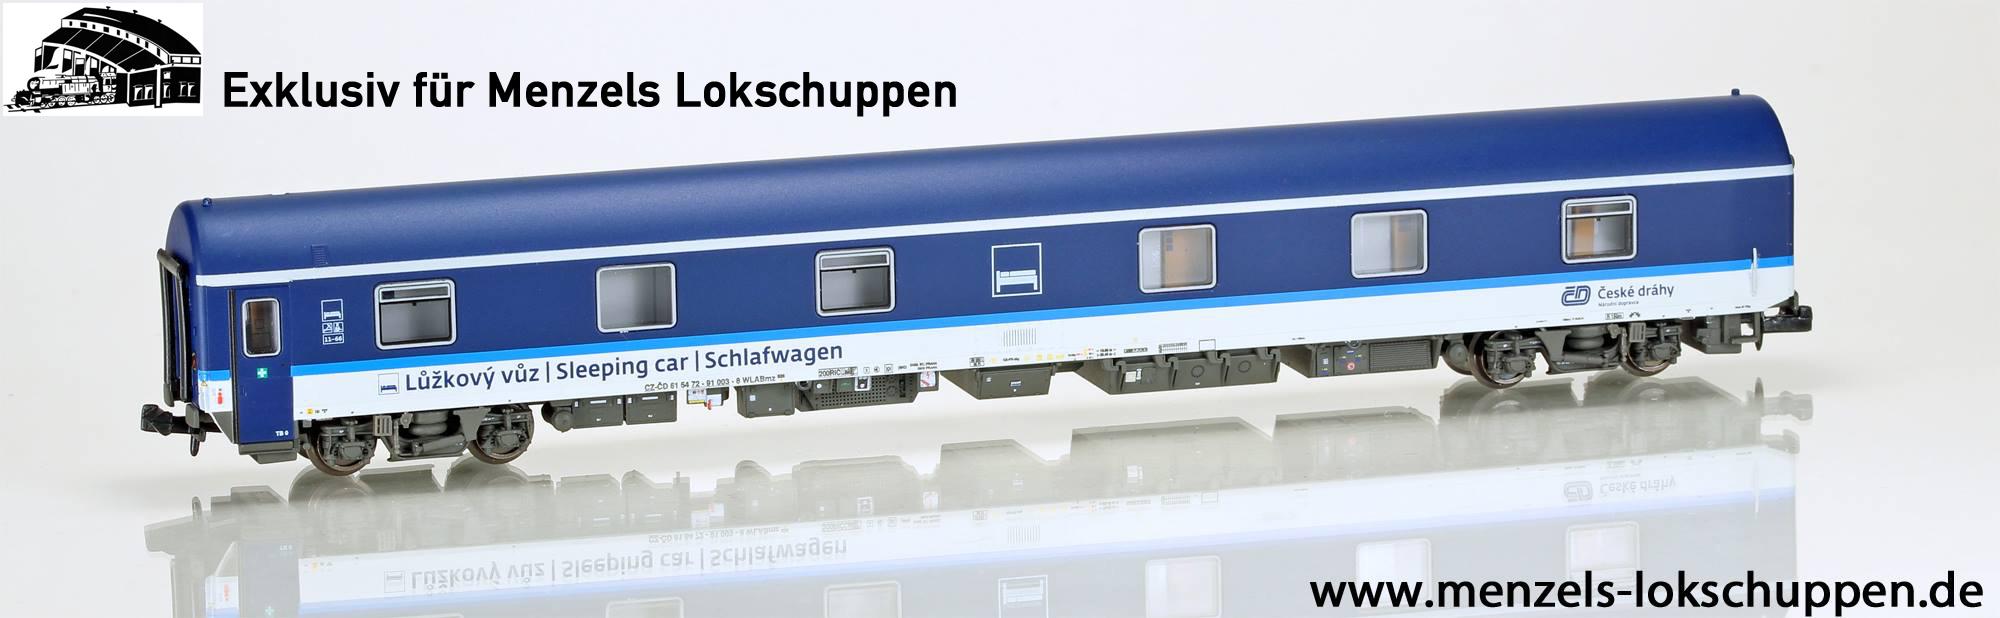 Ls Models 98152 Cd Schlafwagen Ep6 Menzels Lokschuppen Onlineshop